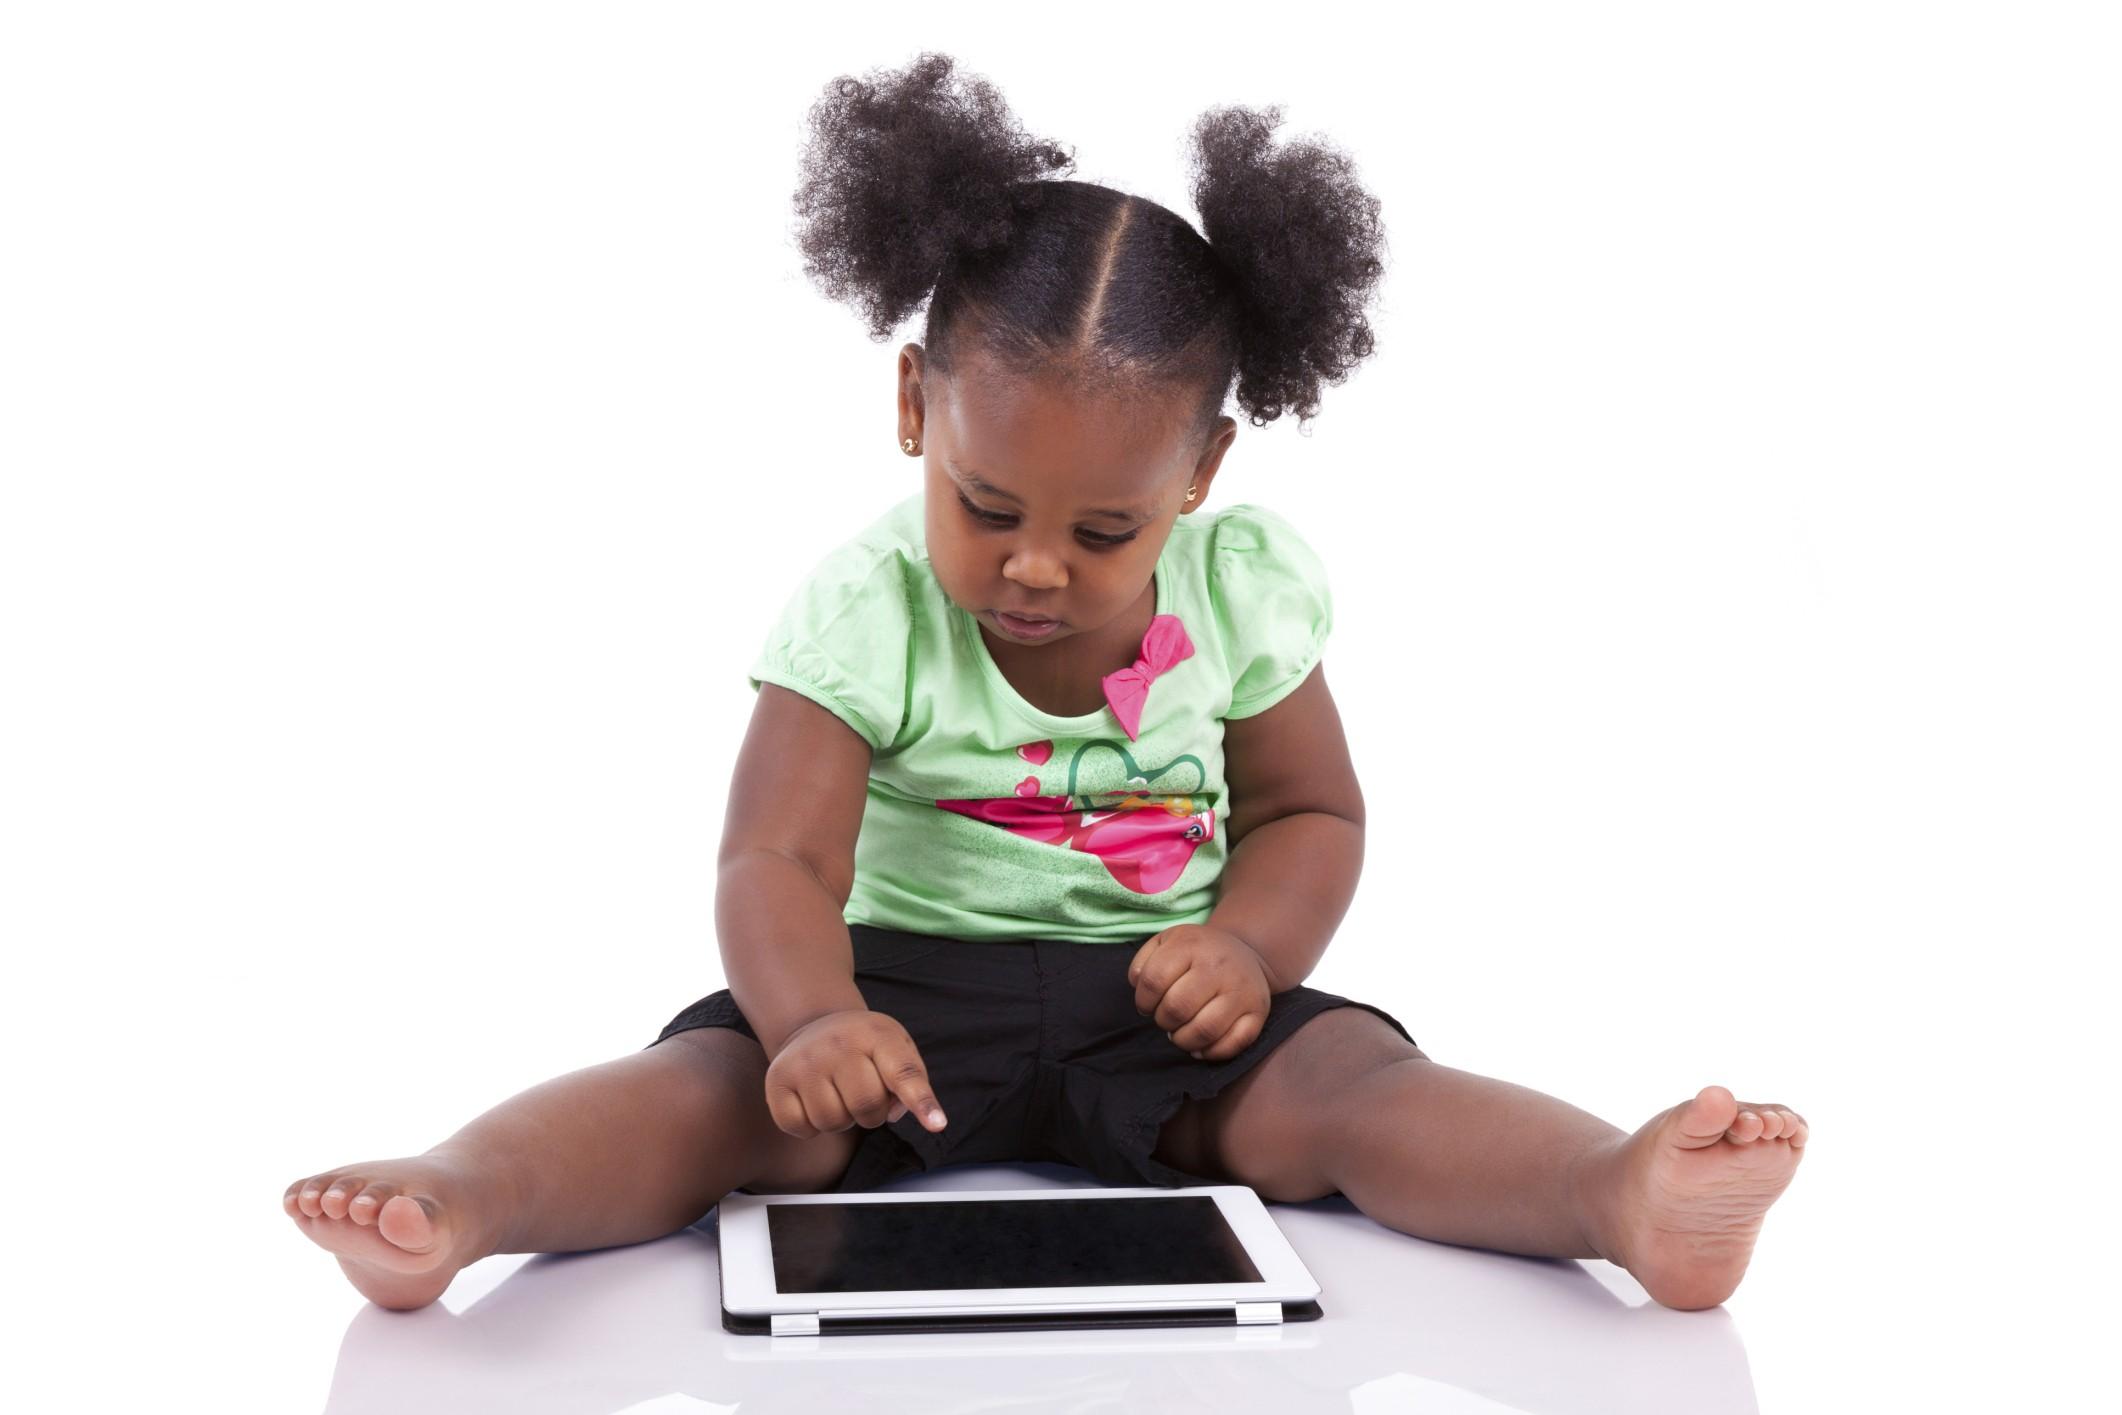 Menina brinca com tablet (Foto: Thinkstock)